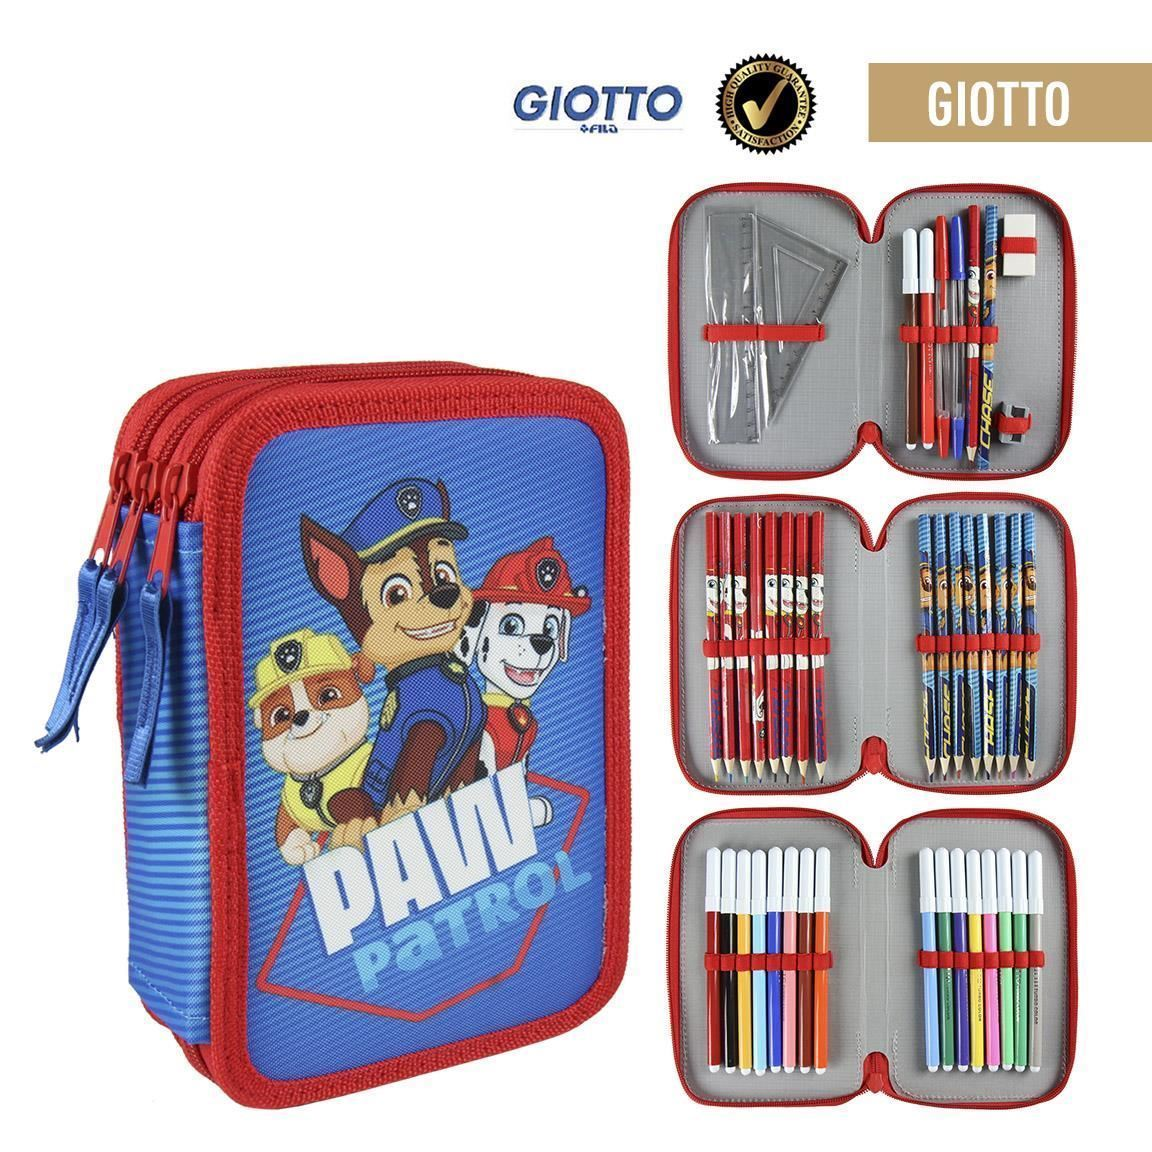 PAW PATROL Small Zip up Pencil Case